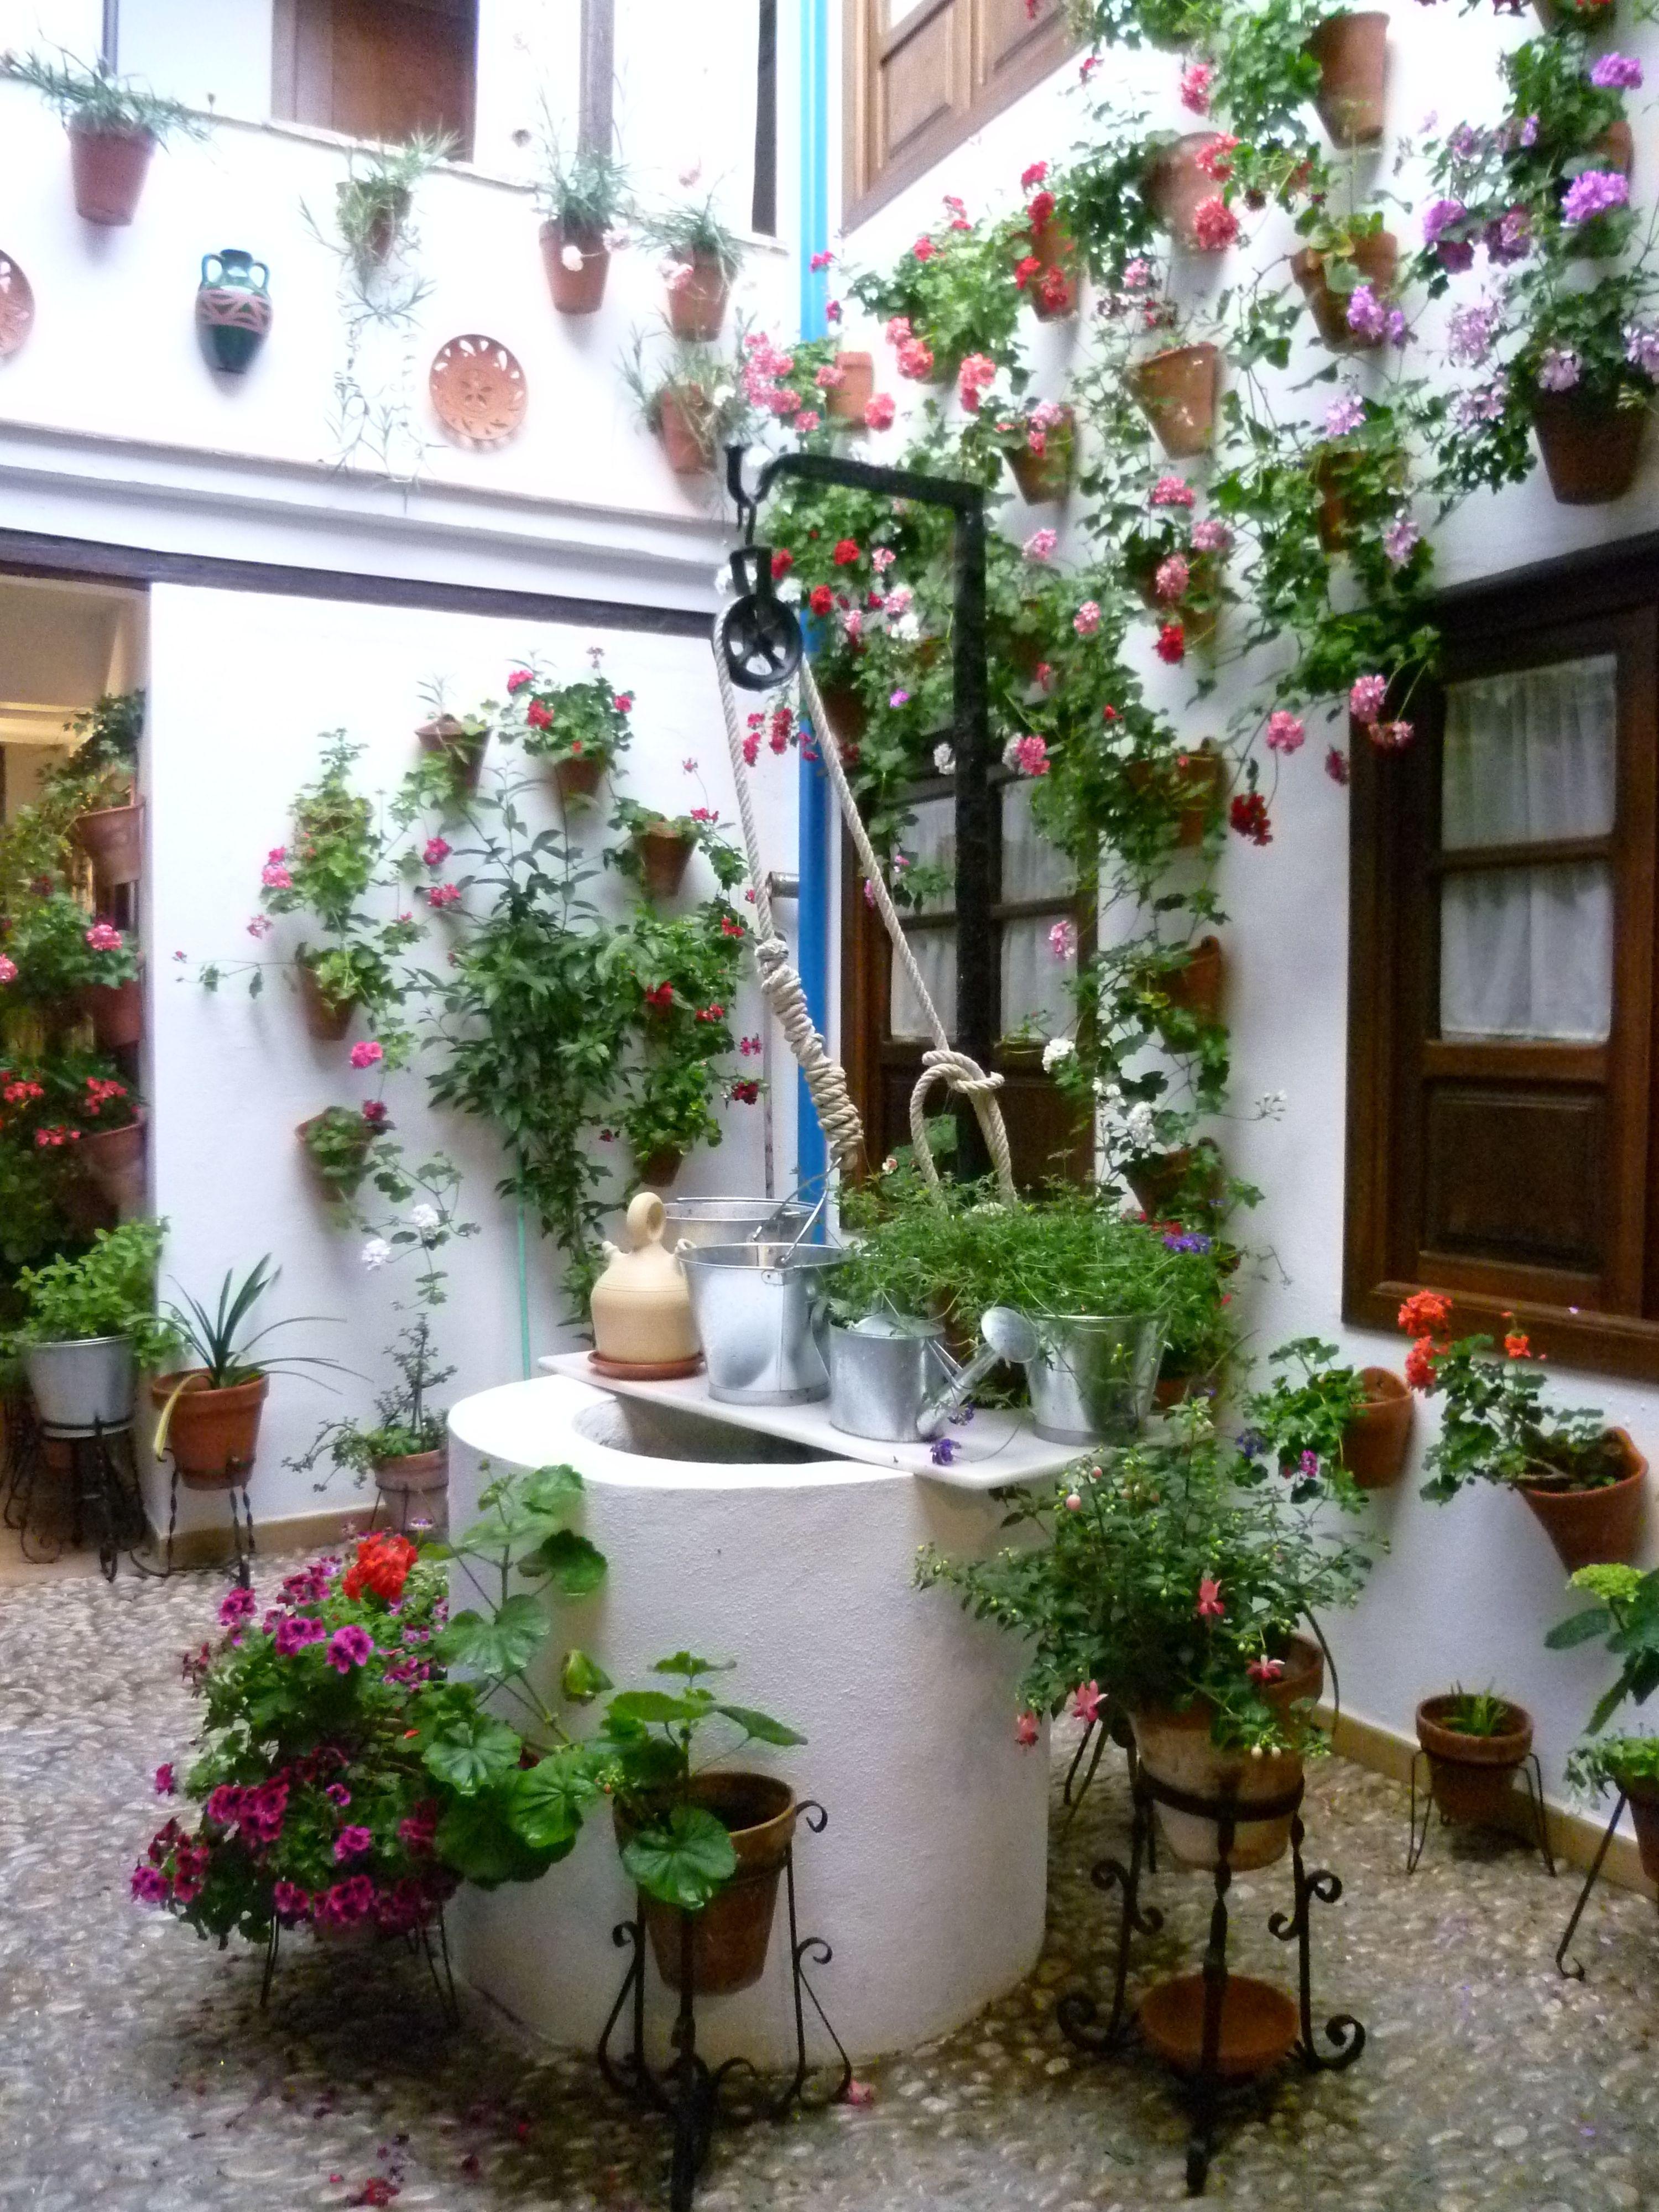 Casa patio andaluz patios andaluces pinterest patios for Patios andaluces decoracion